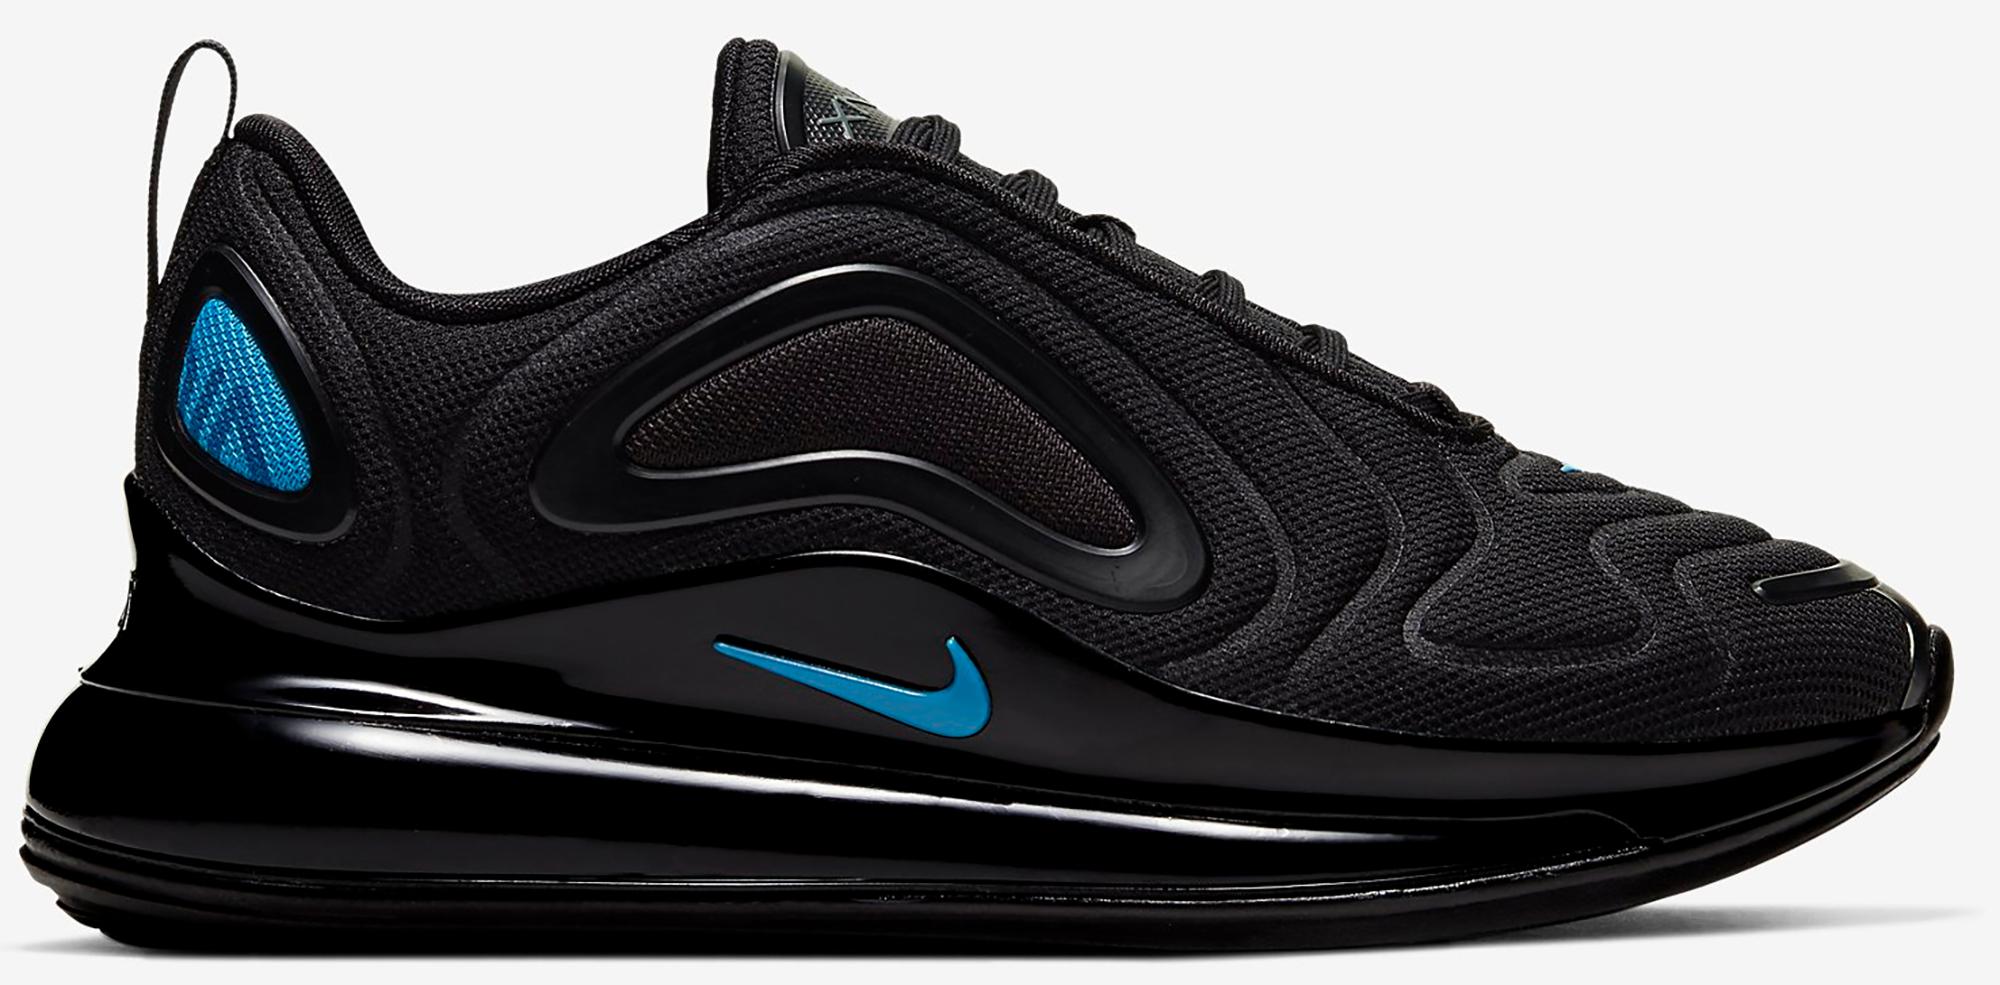 Nike Air Max 720 Just Do It Black (GS